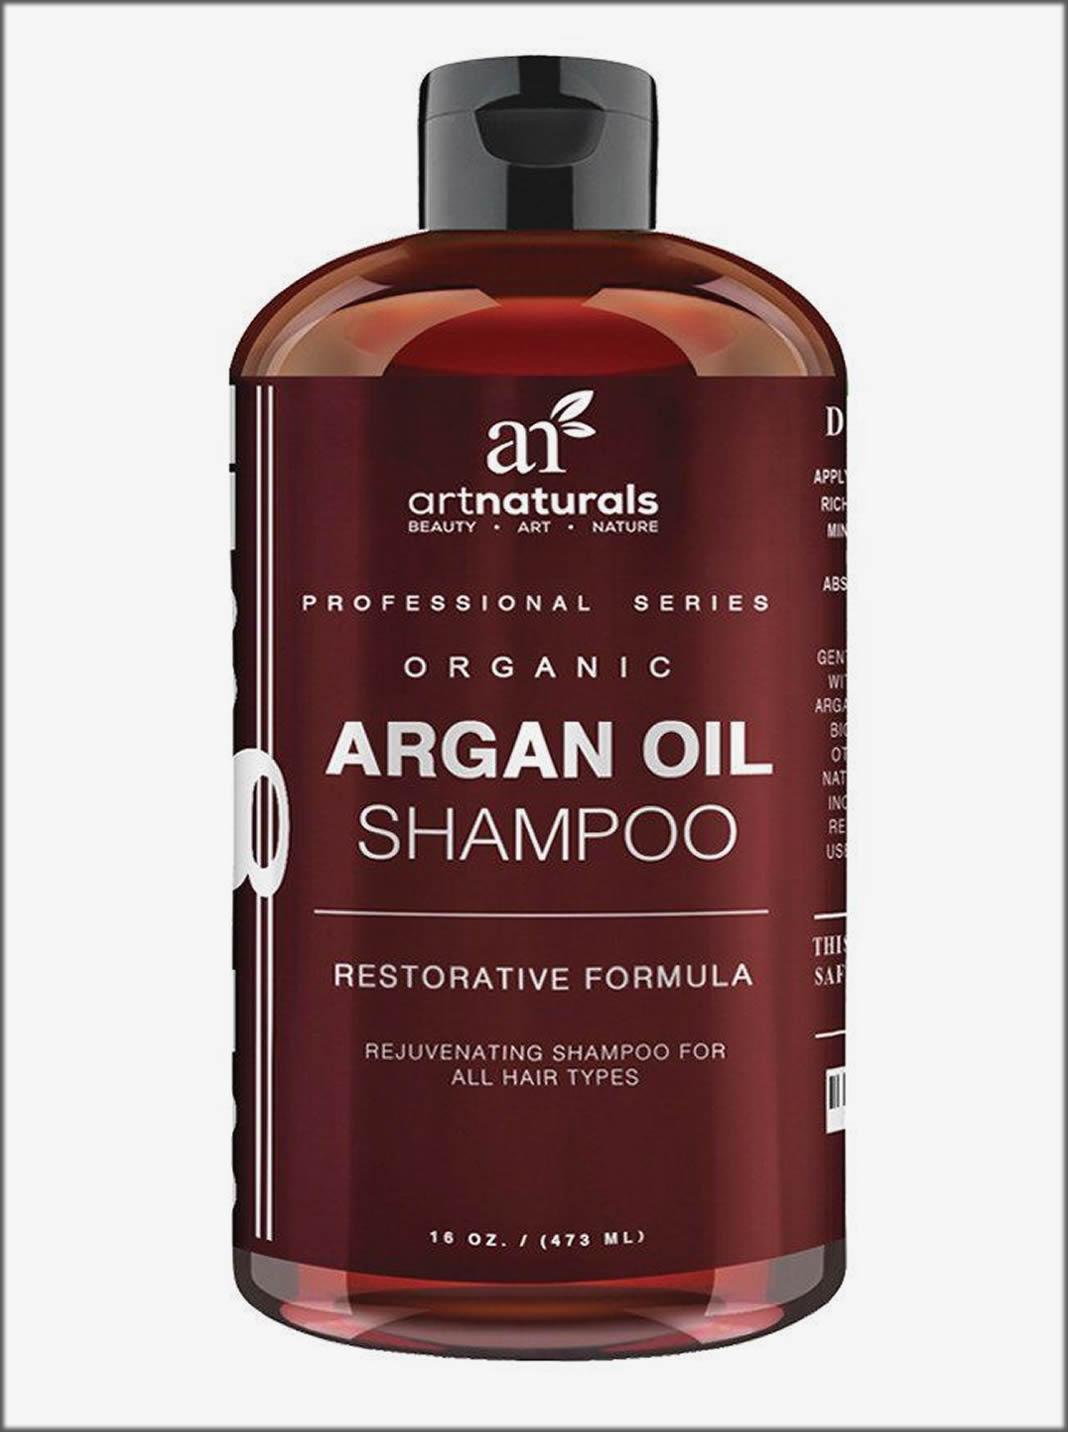 Organic Argan Oil Shampoo Restorative Formula